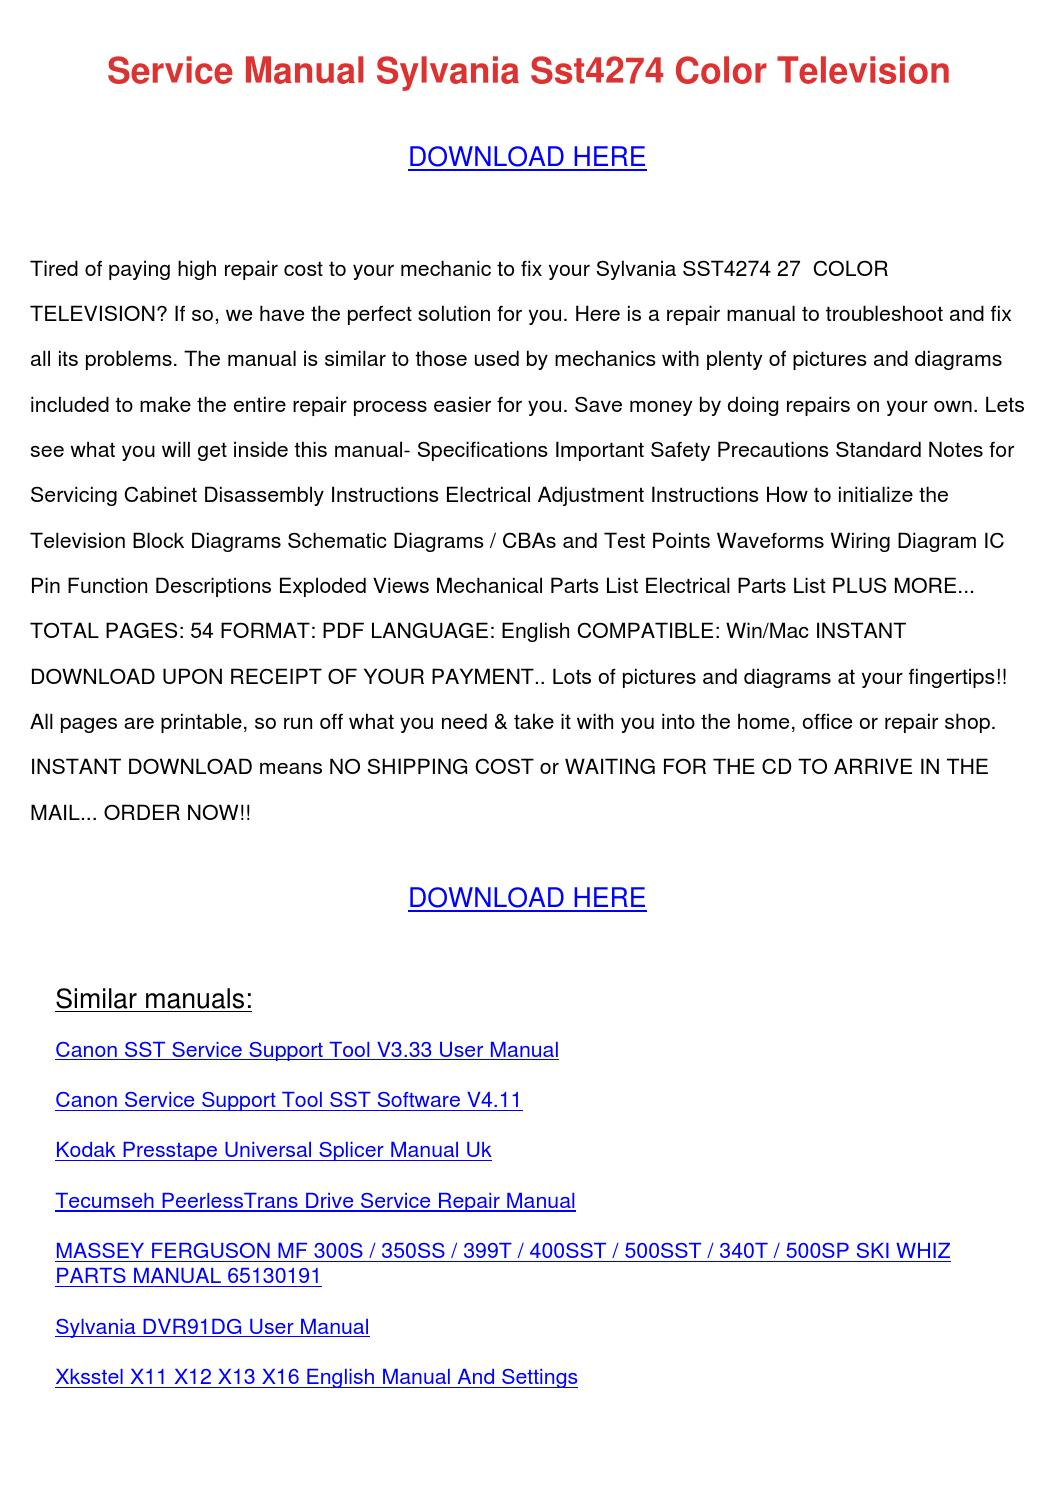 Service Manual Sylvania Sst4274 Color